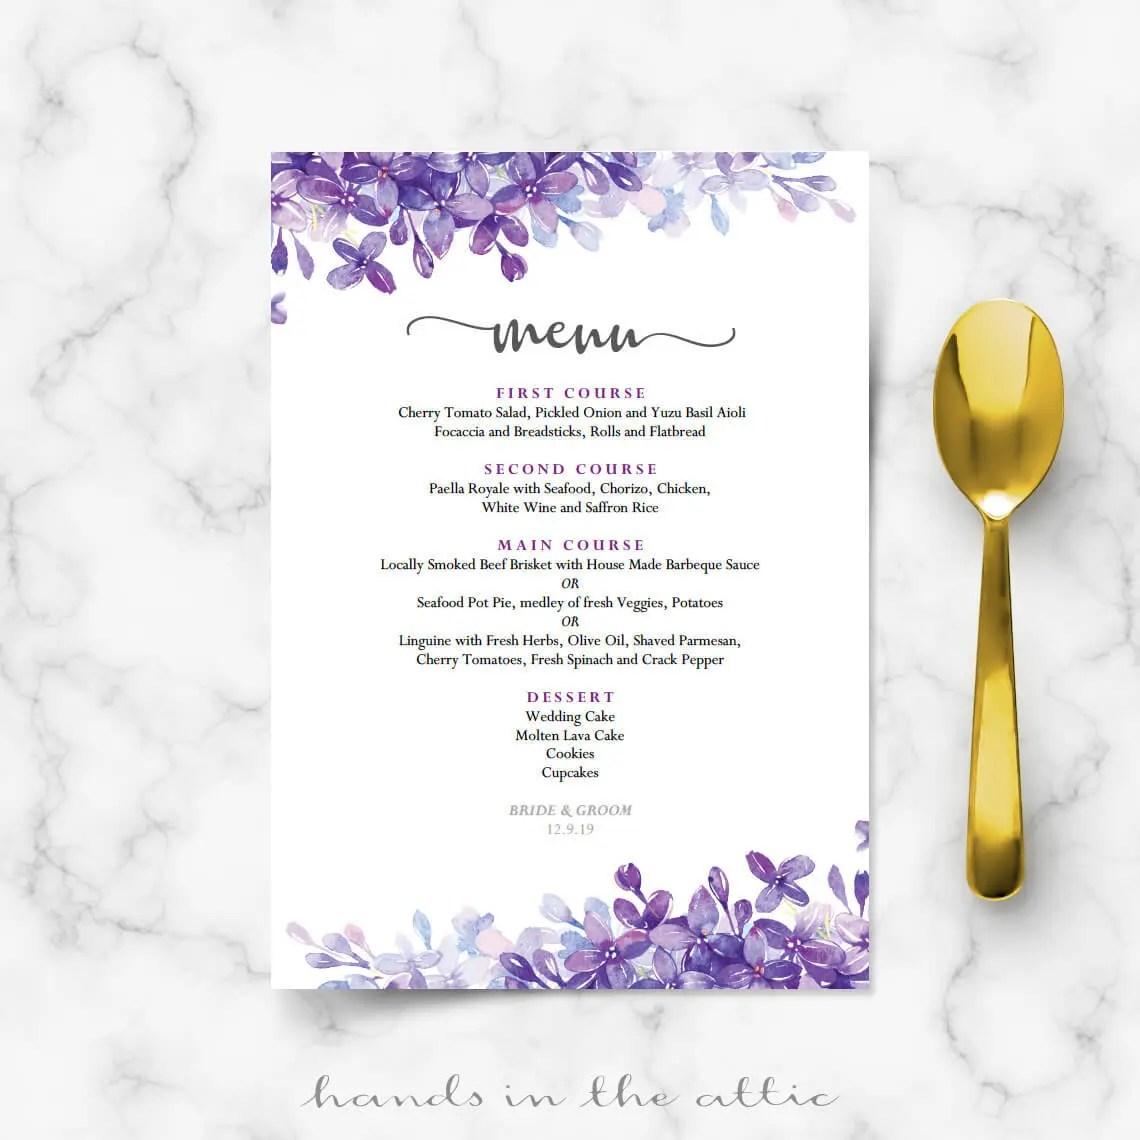 Printable menu cards for weddings, lilac lavender periwinkle wedding